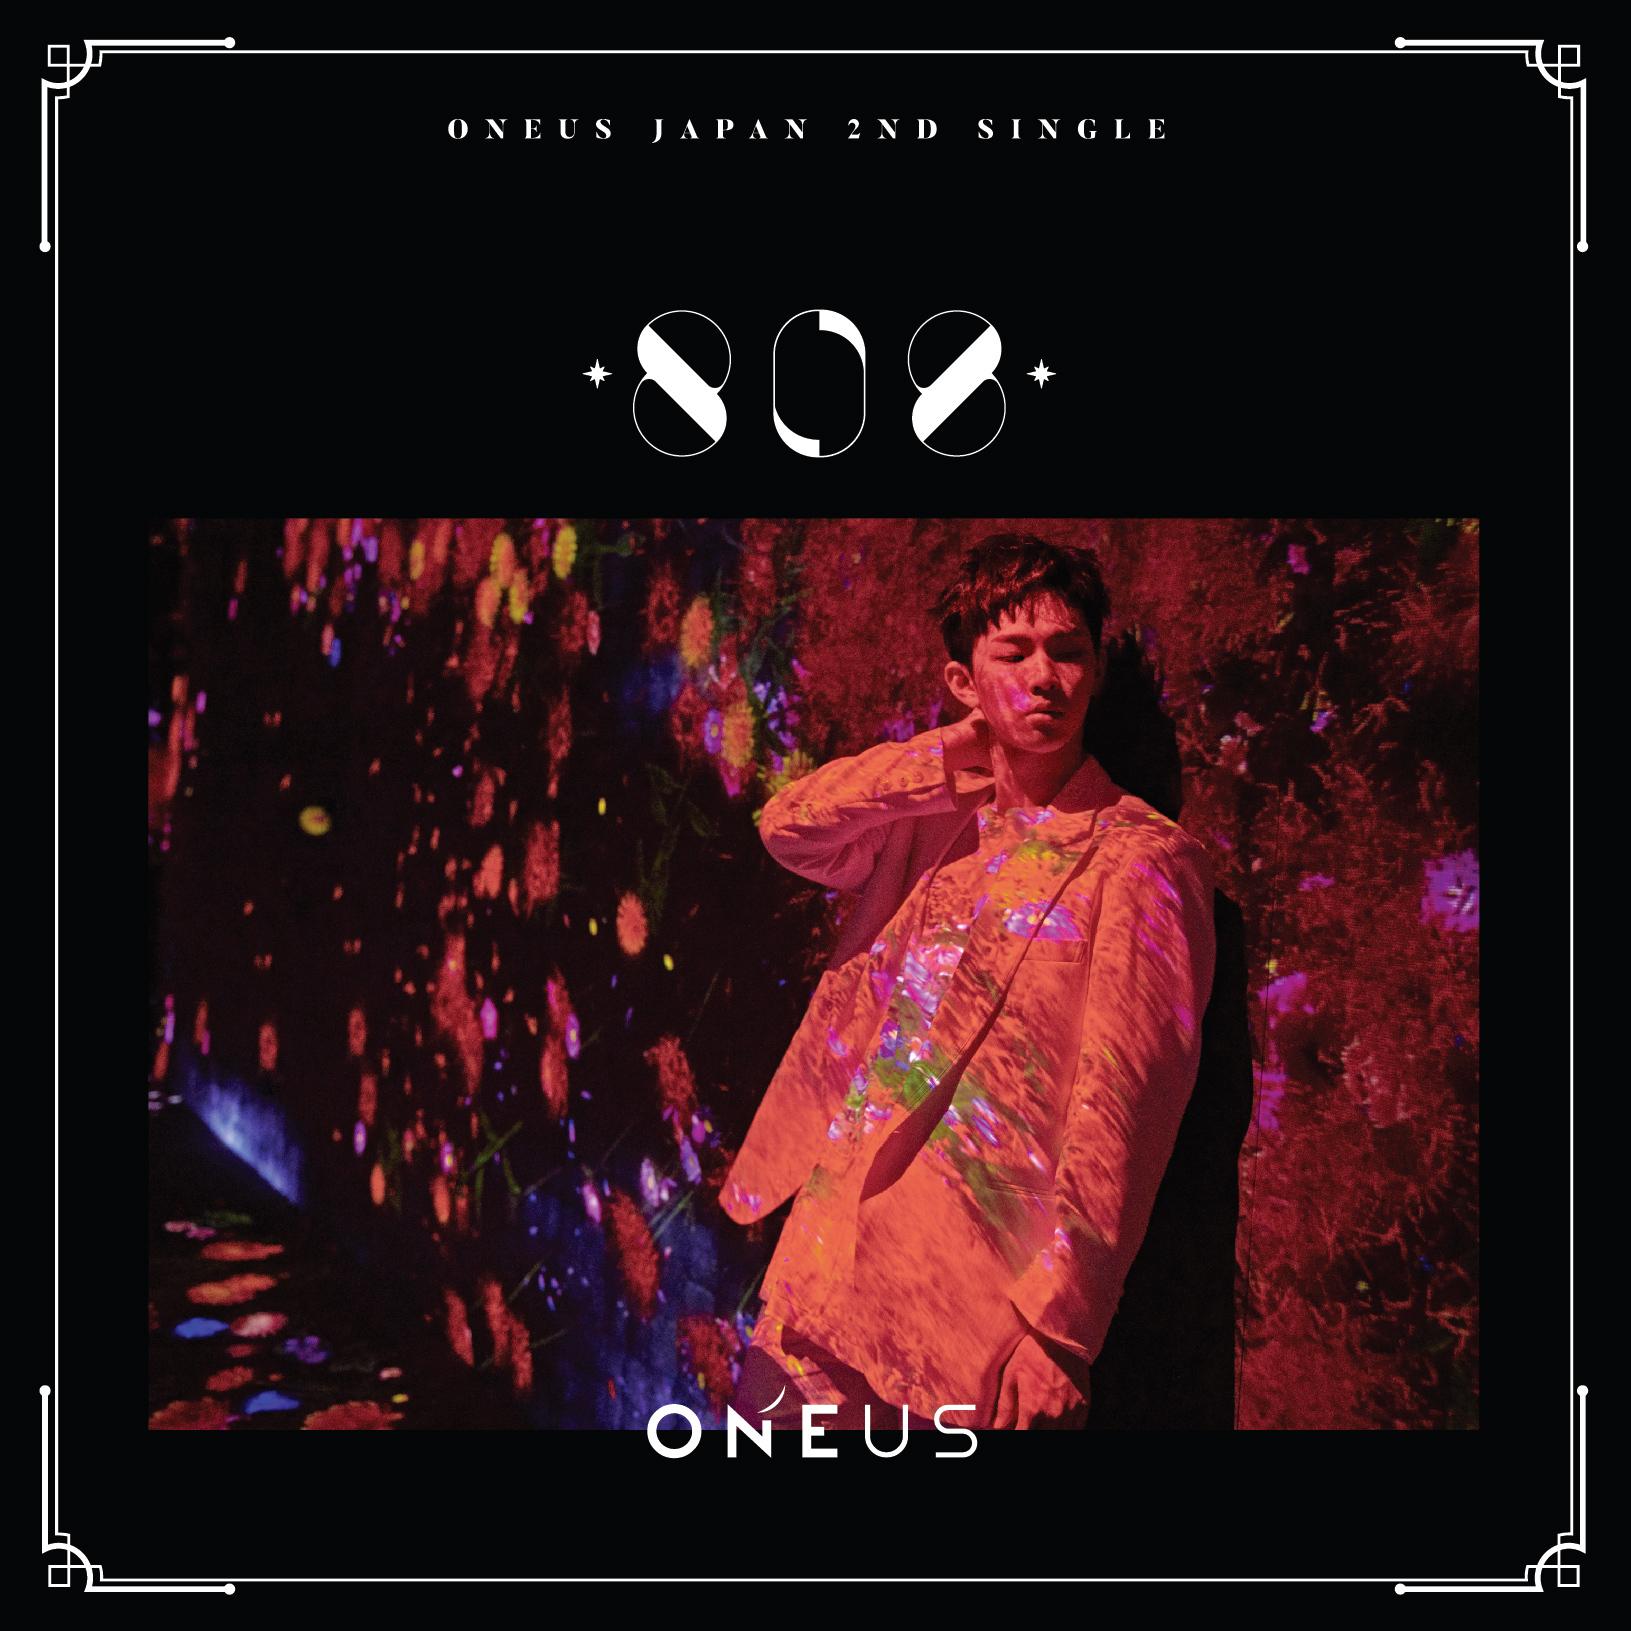 ONEUS Japan 2nd Single「808」メンバー別ジャケット盤(イド)